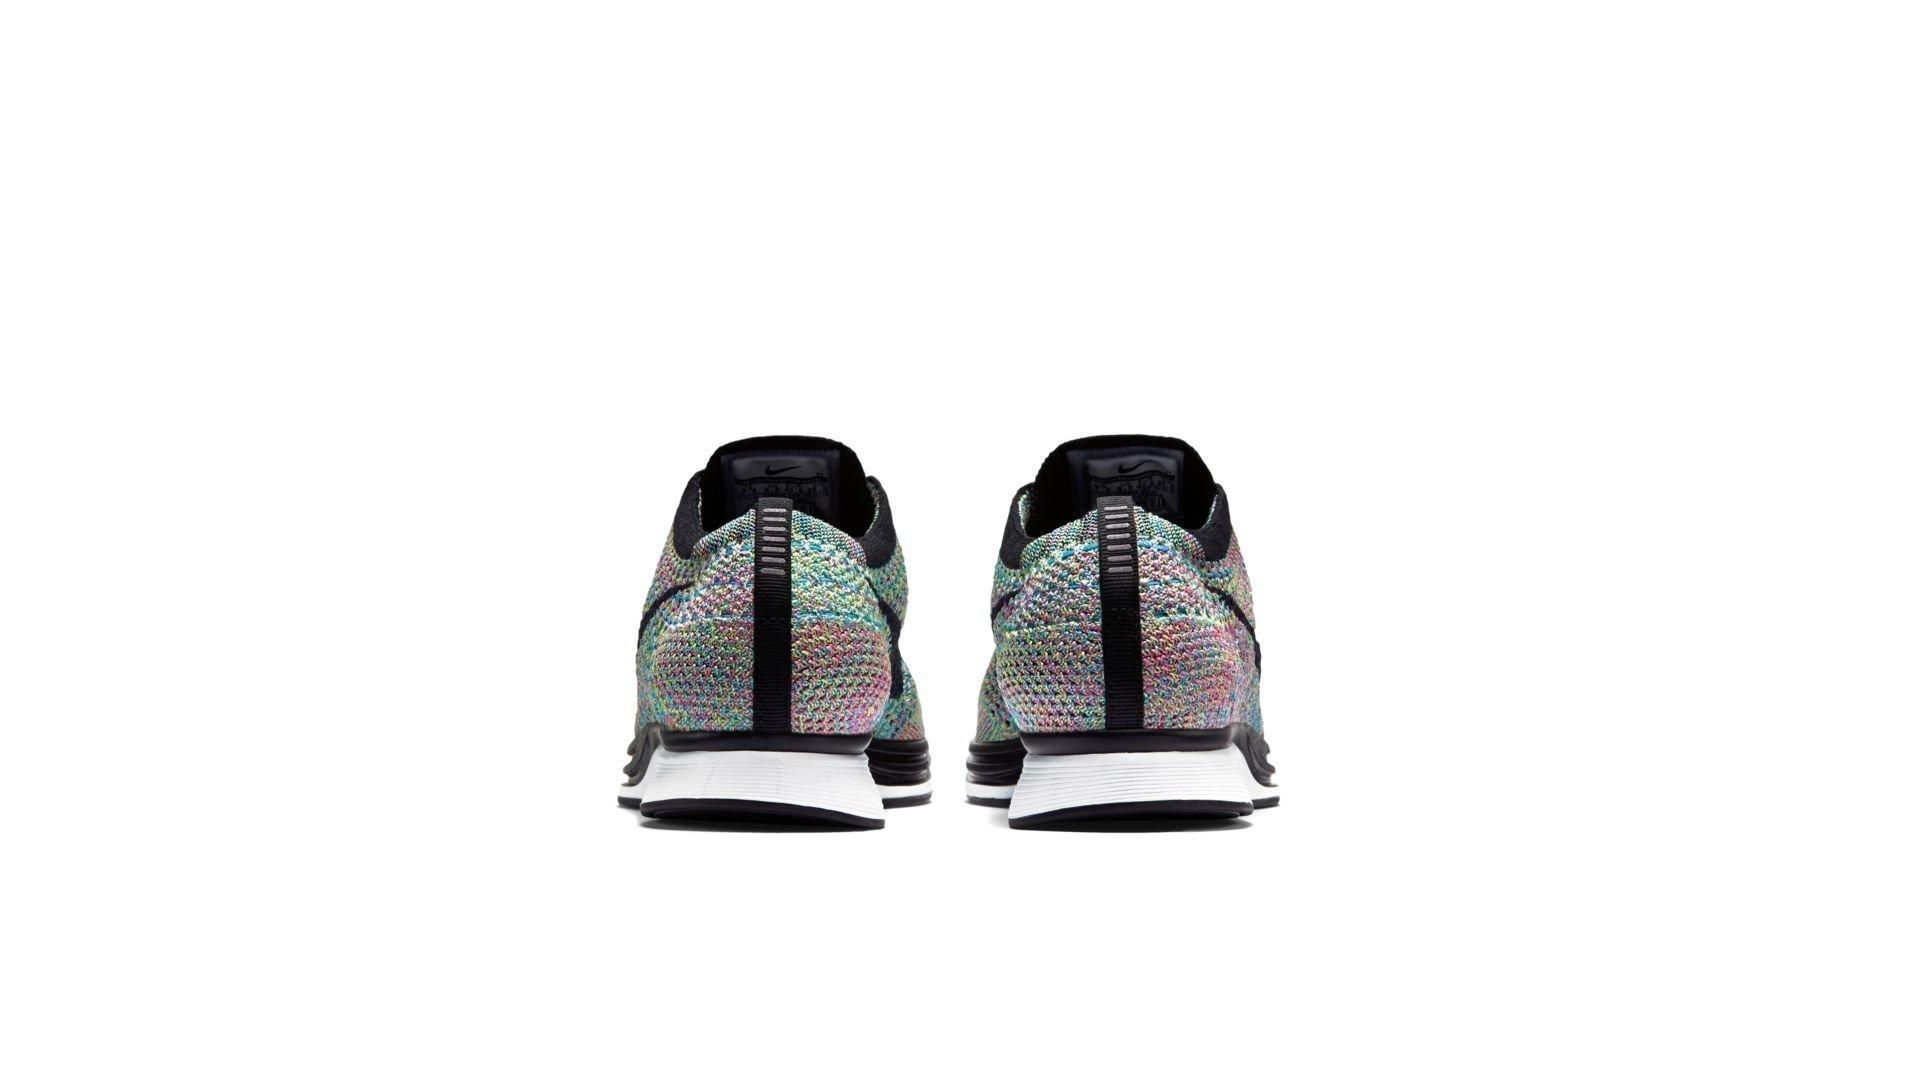 Nike Flyknit Racer Multi-Color 2.0 (2015/2017) (526628-304)